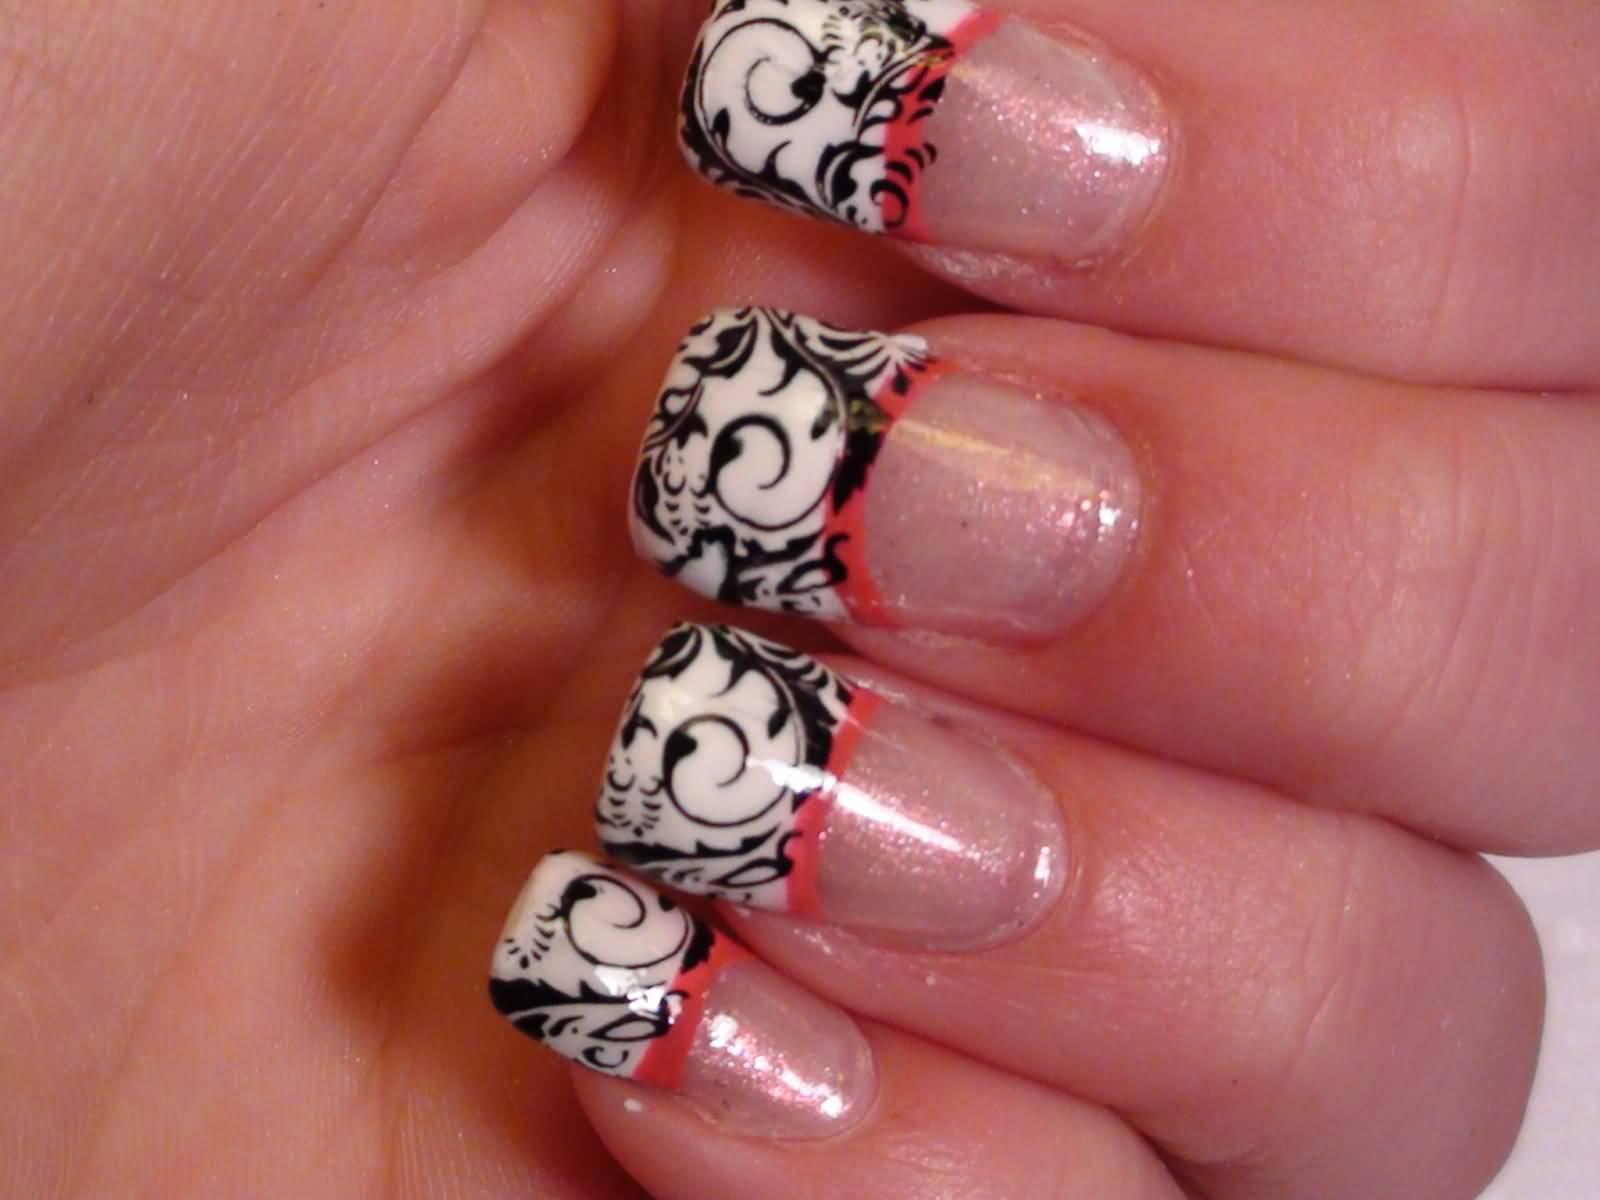 White French Tip Nail Art With Black Flower Design